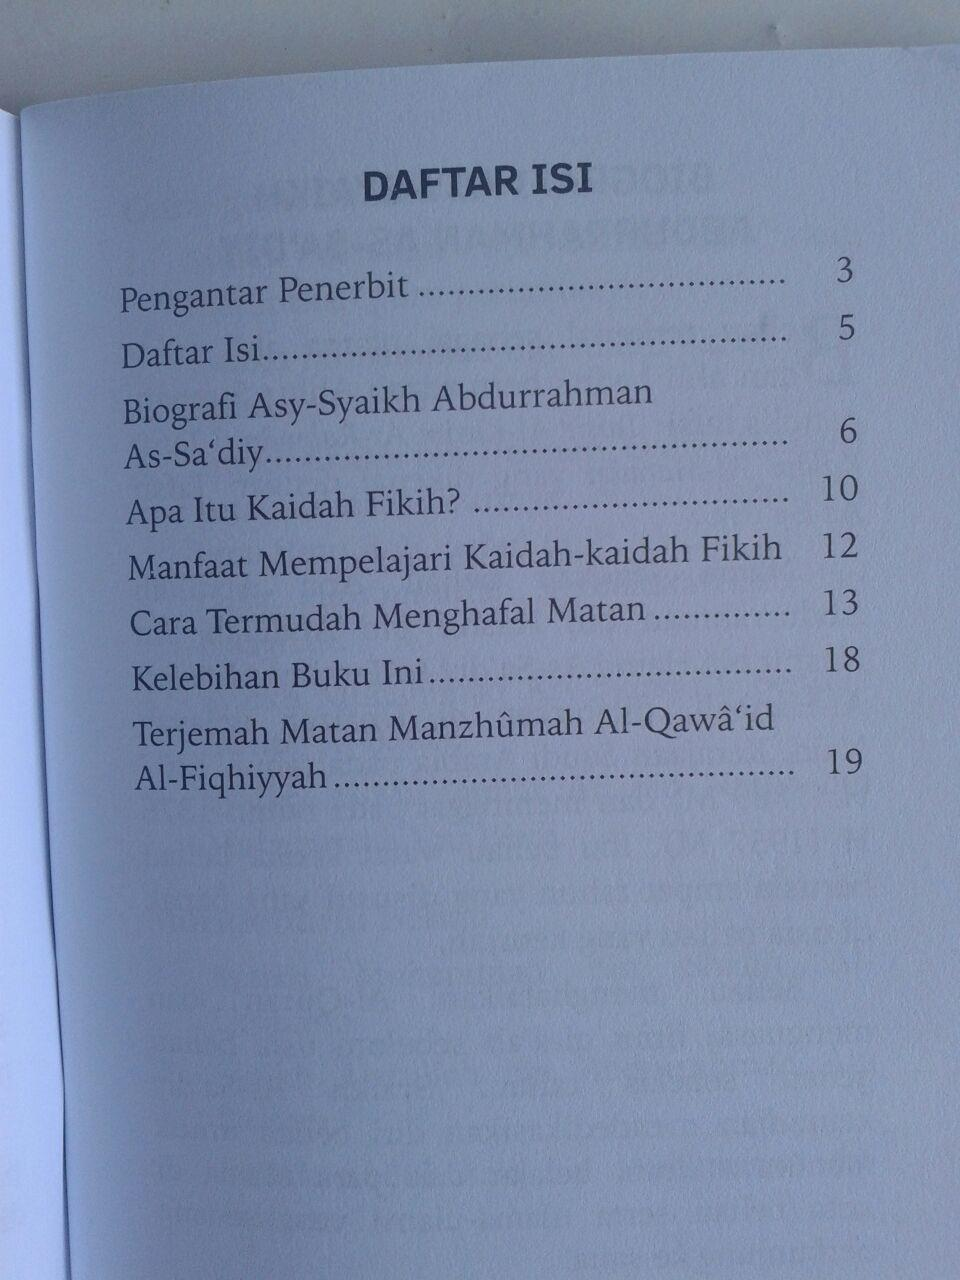 Buku Saku Manzhumah Al-Qawaid Al-Fiqhiyyah As-Sa'diy isi